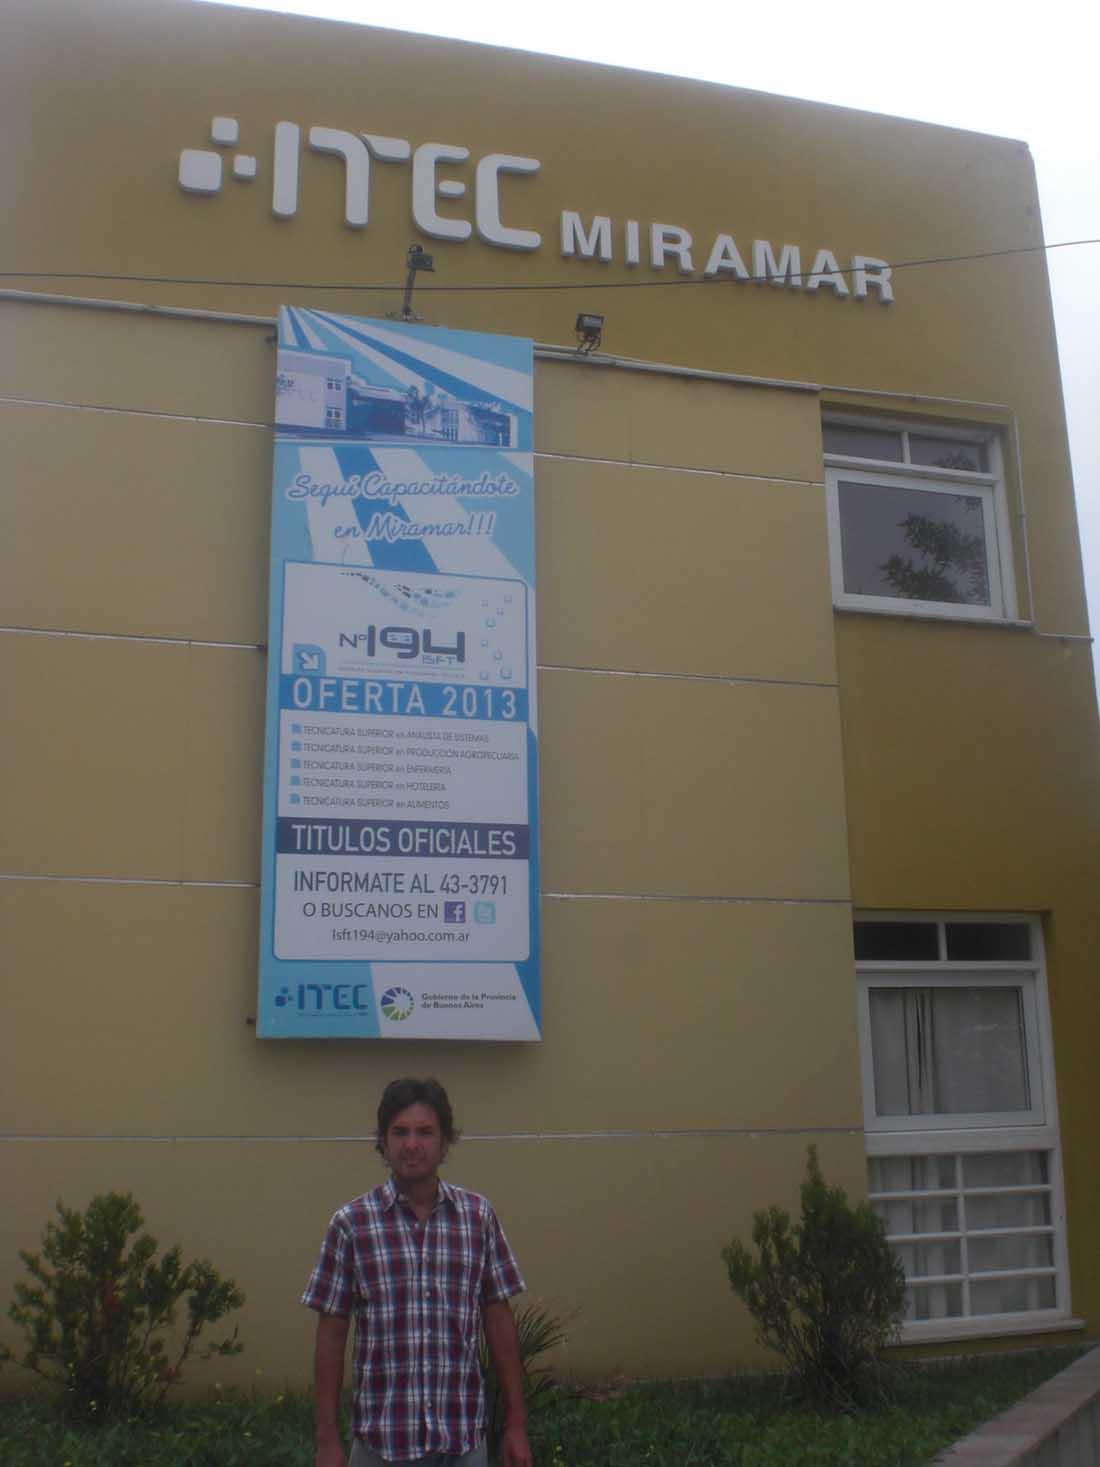 ITEC Instituto Superior de Formación Técnica Miramar